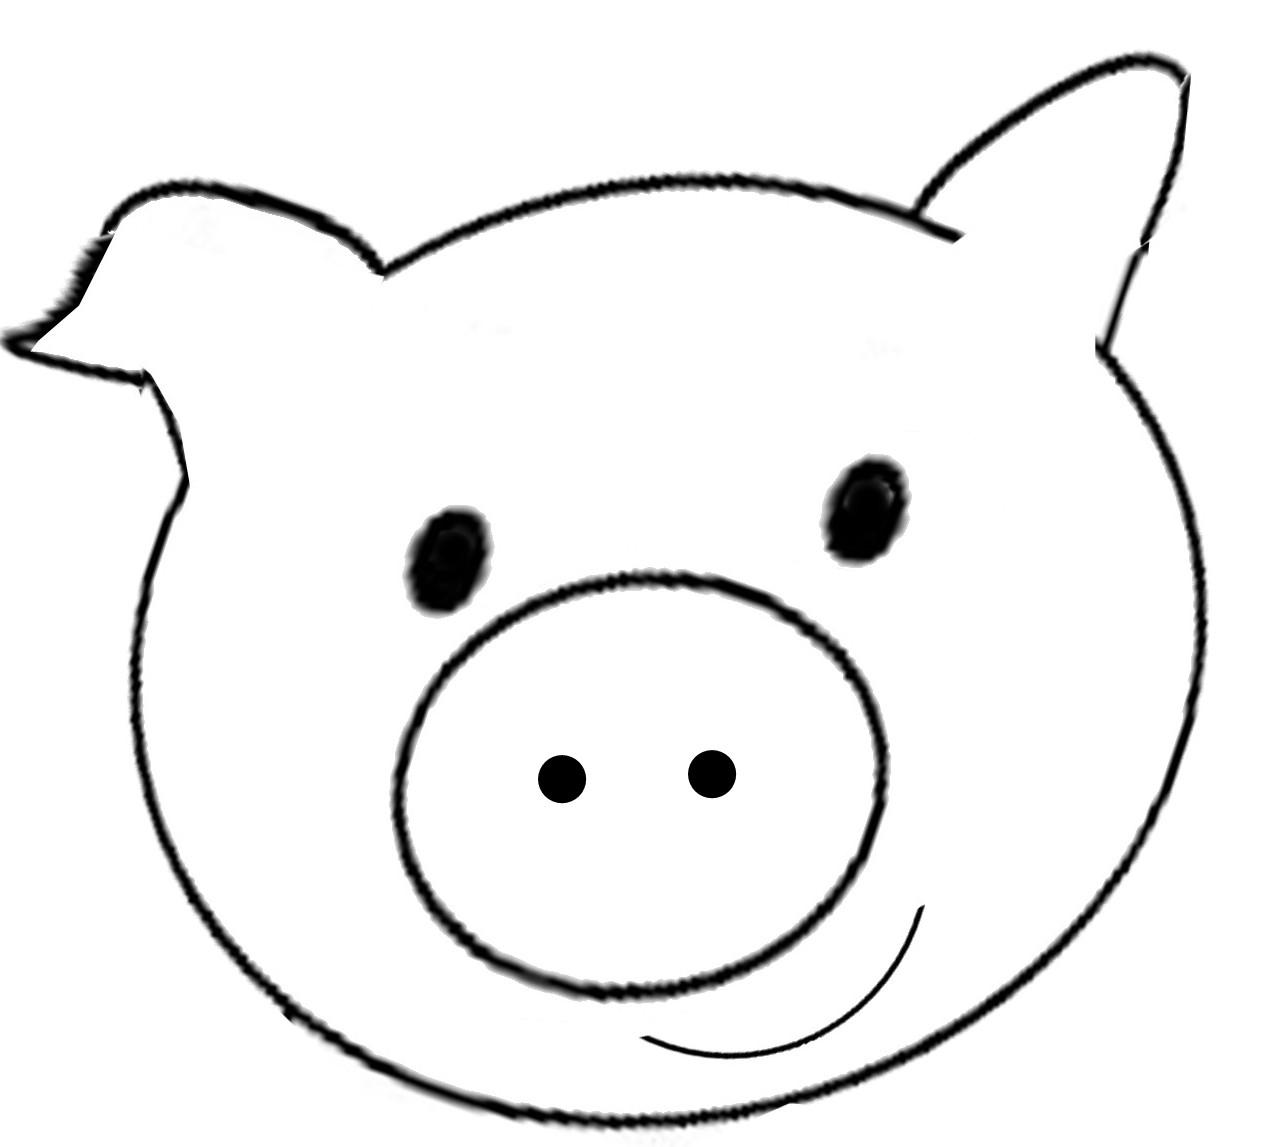 Pig Template Printable Key template for kids